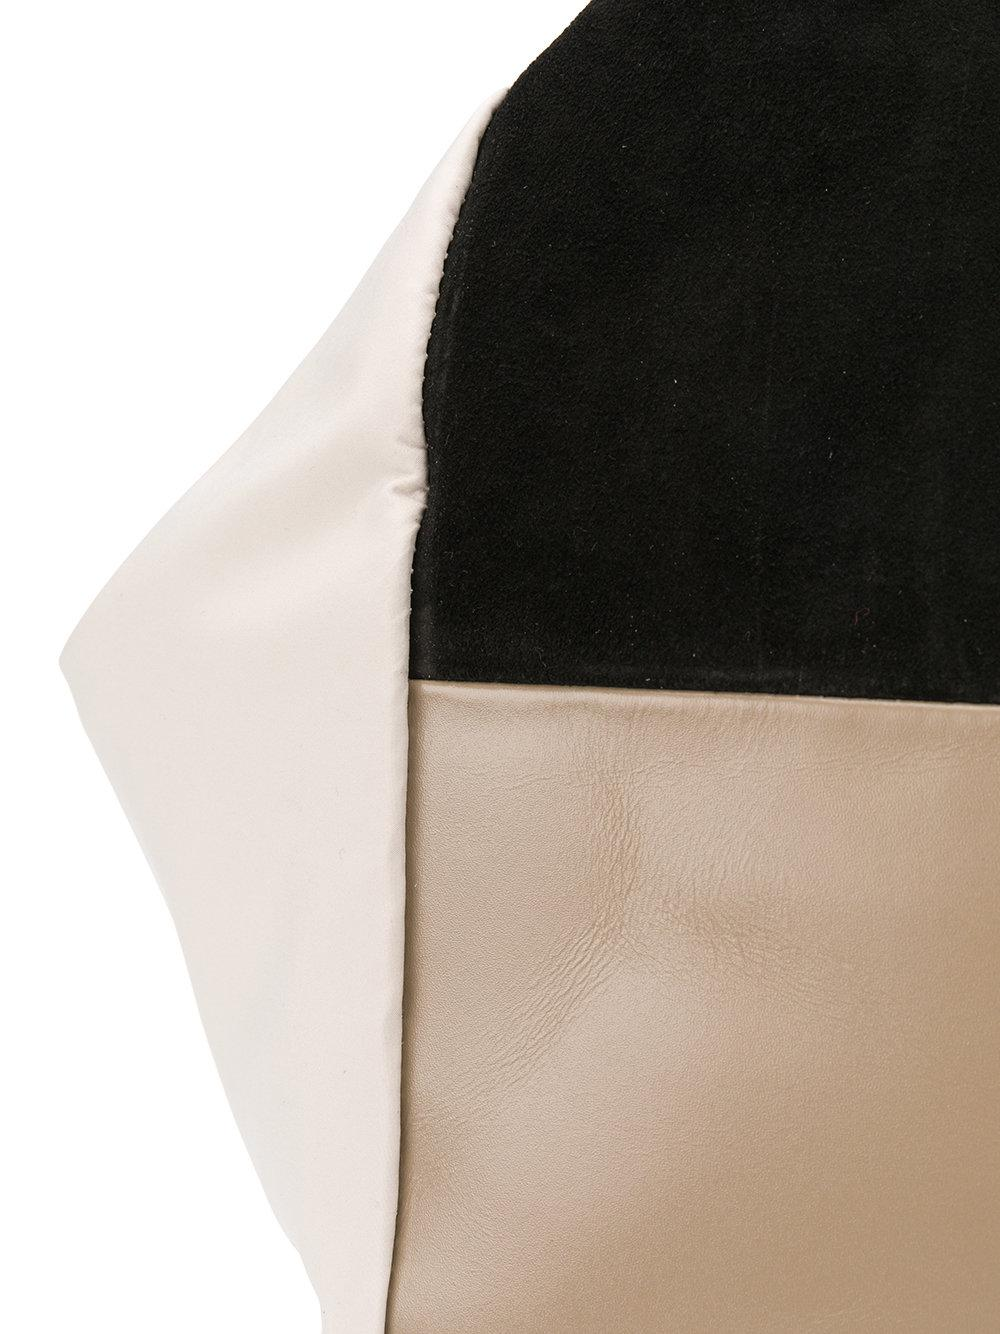 Carmina Campus Leather Colour-block Patch Tote